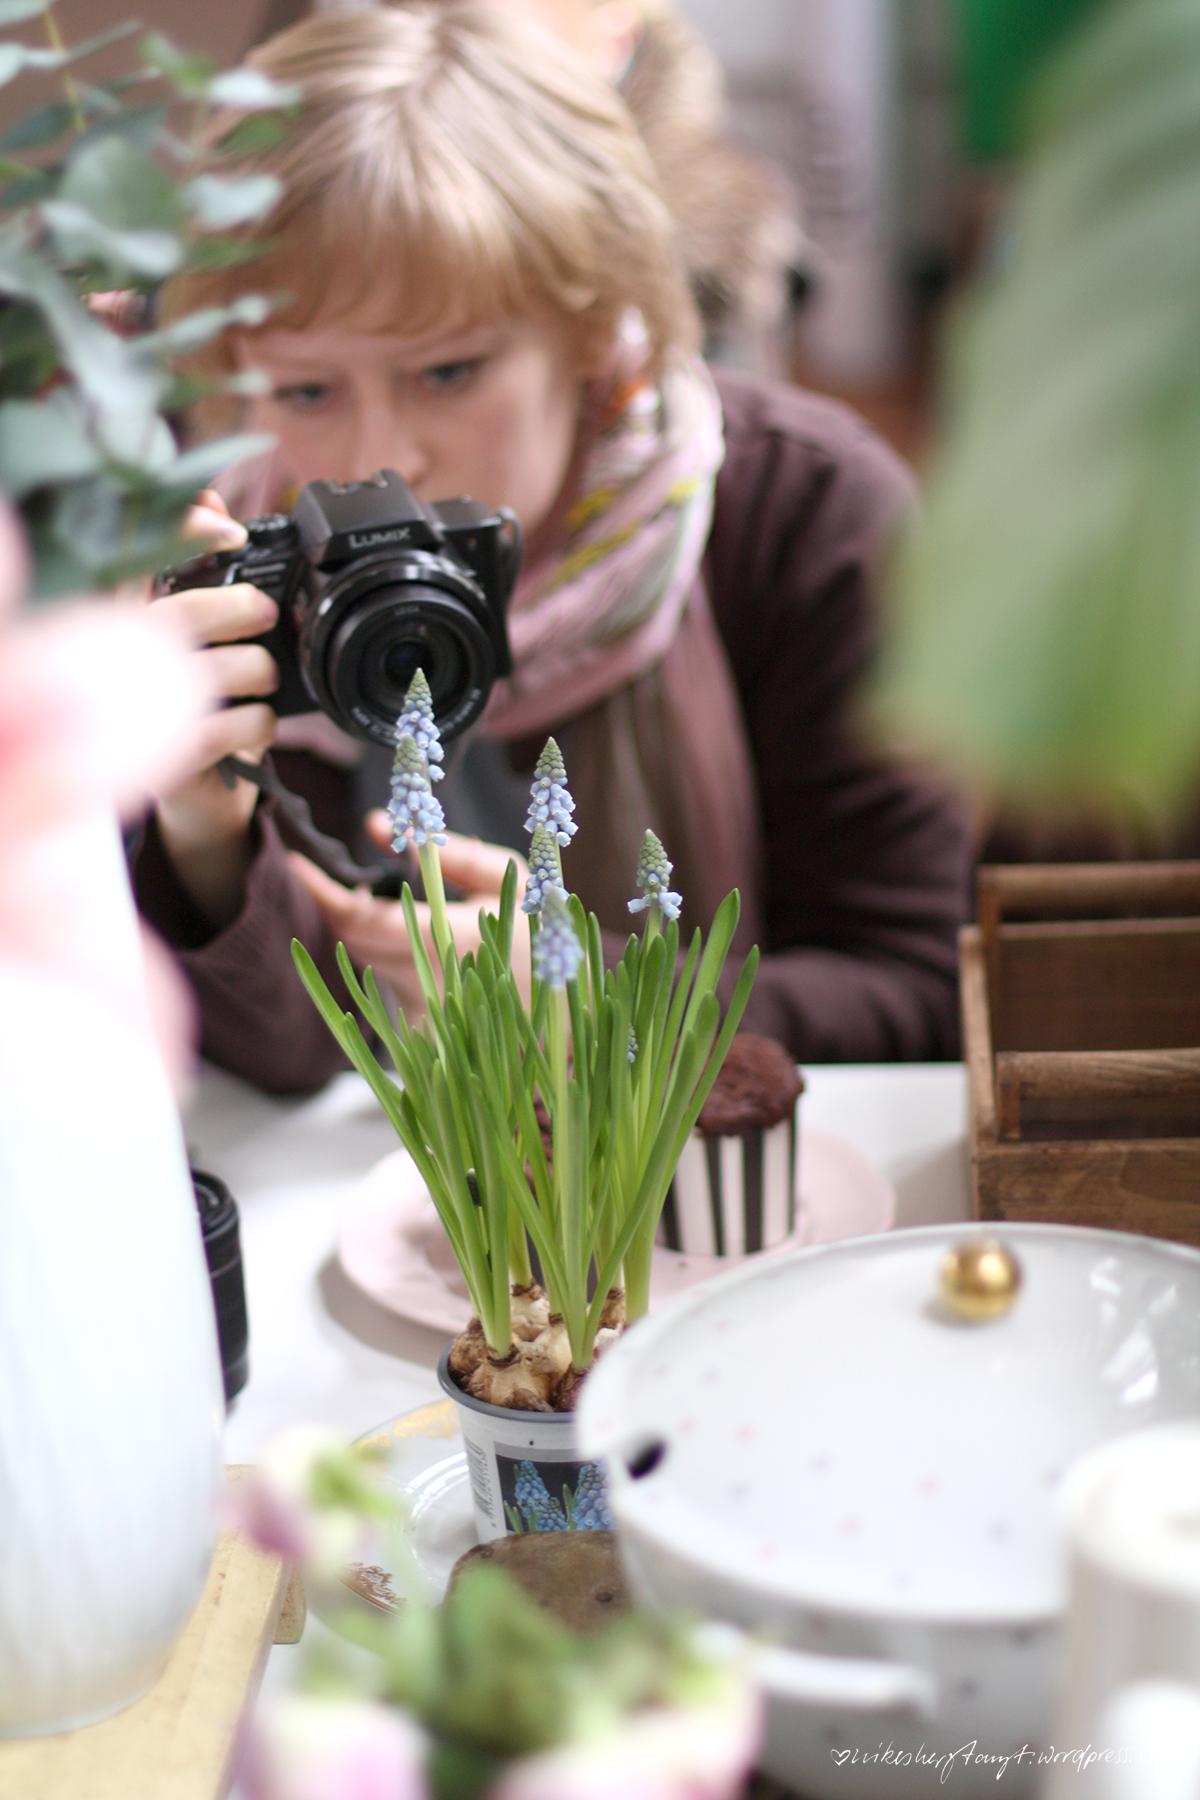 fotoworkshop, marmeladekisses, fotografie, nikesherztanzt, oppa franz, duisburg